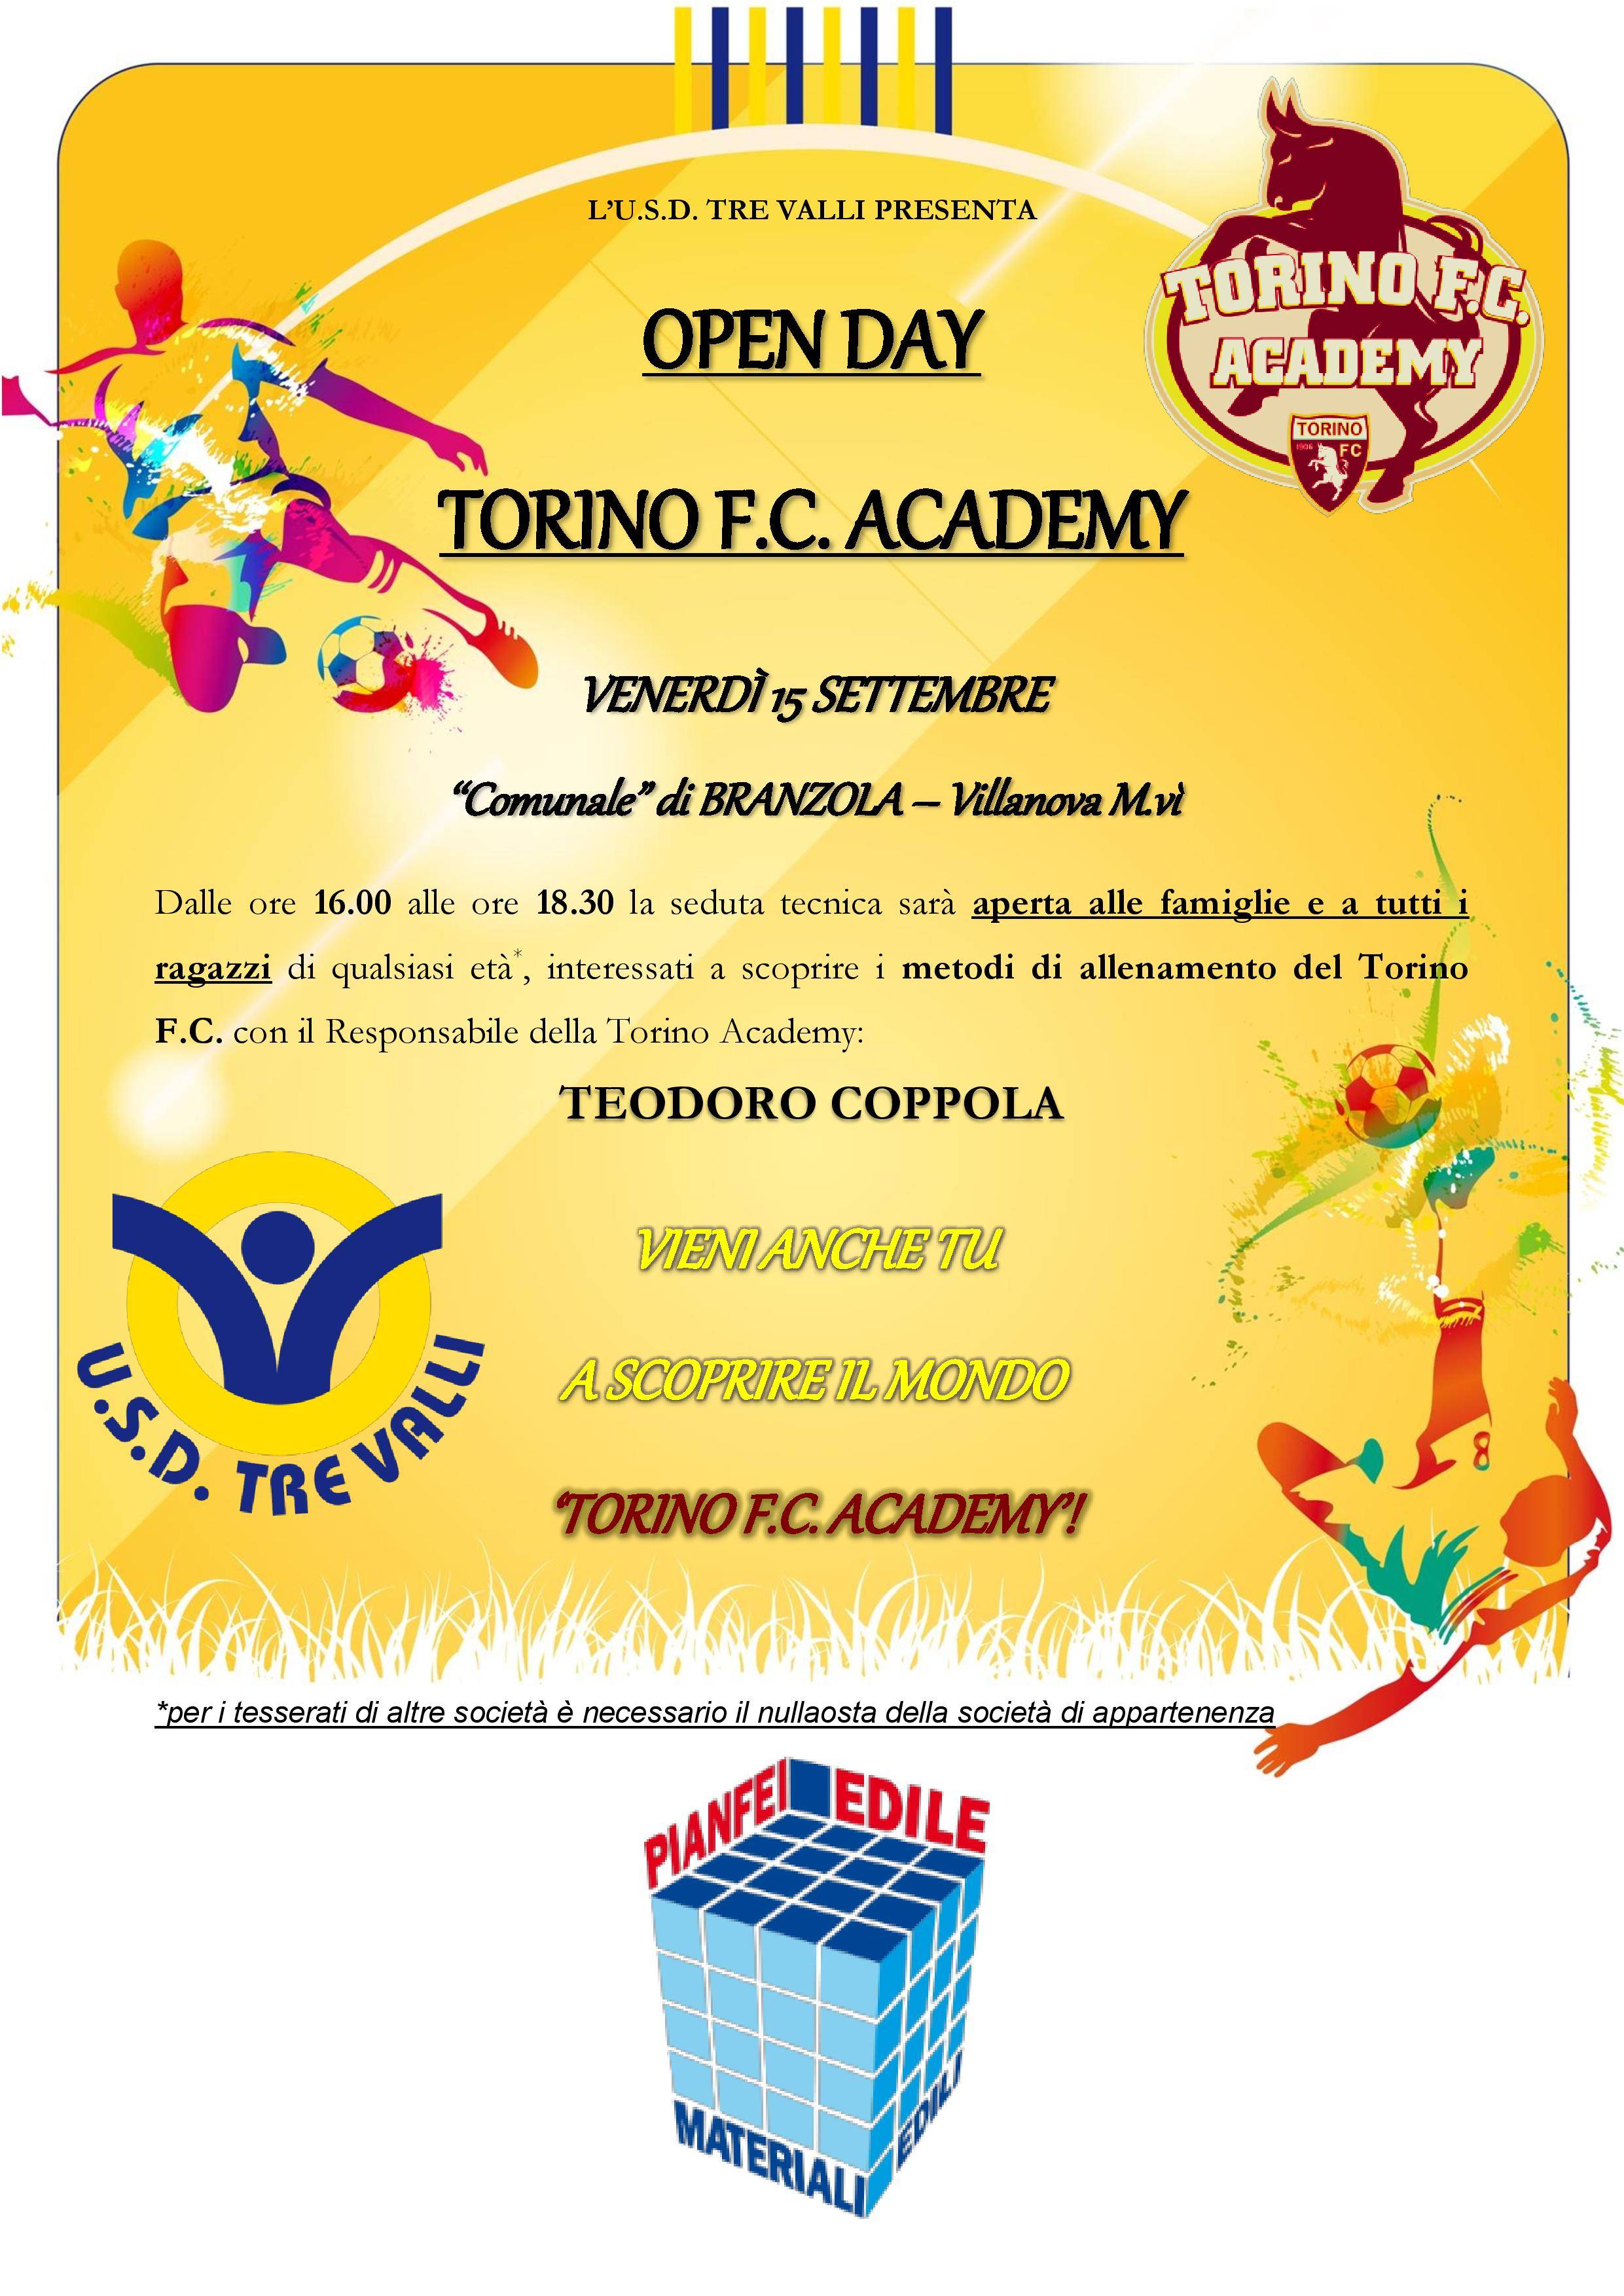 OPEN DAY – TORINO ACADEMY, 15/09/17